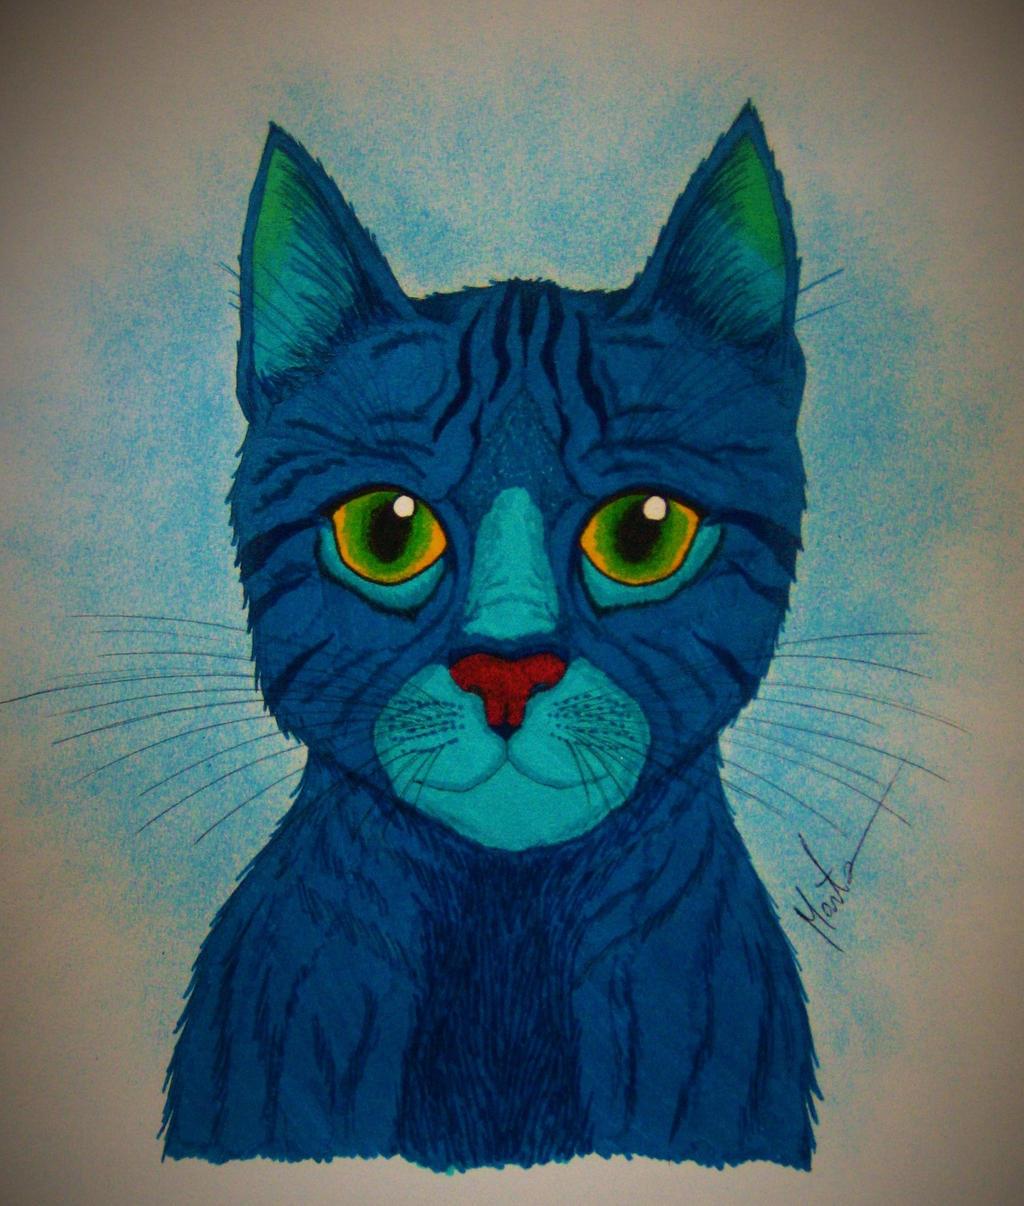 Blue Cat by Natsu-chan-94